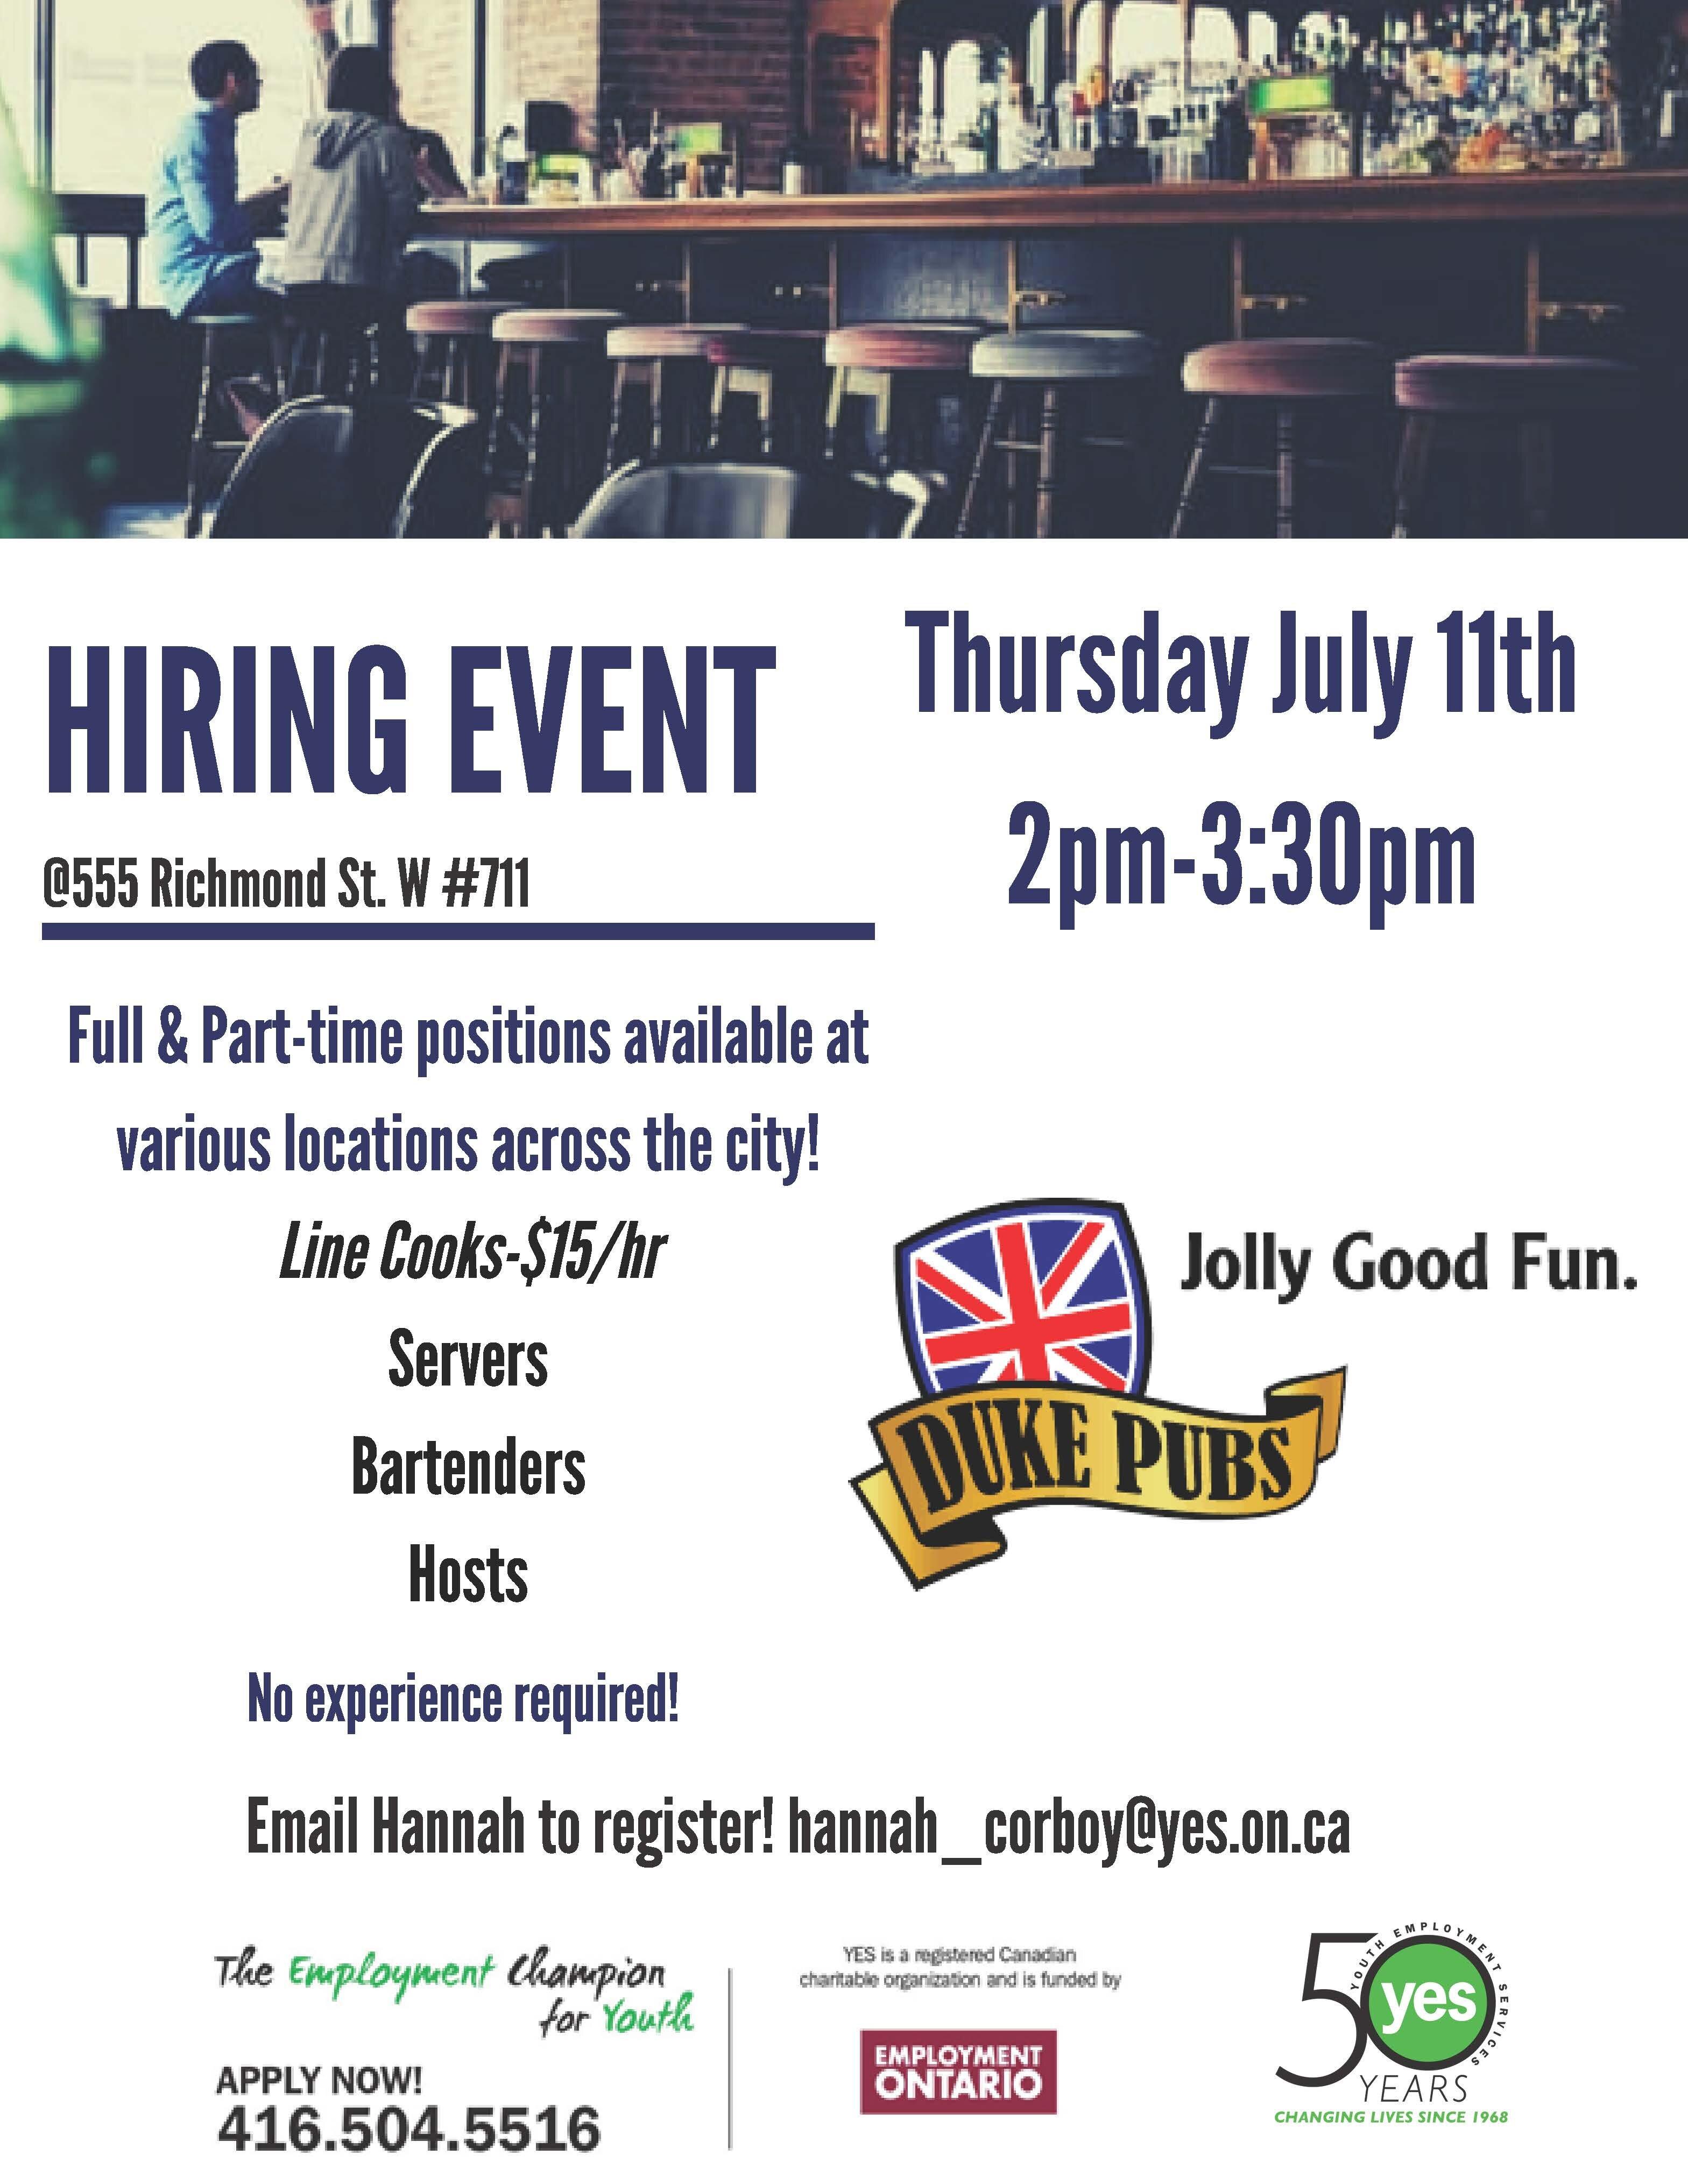 Duke Pubs Hiring Event @ YES